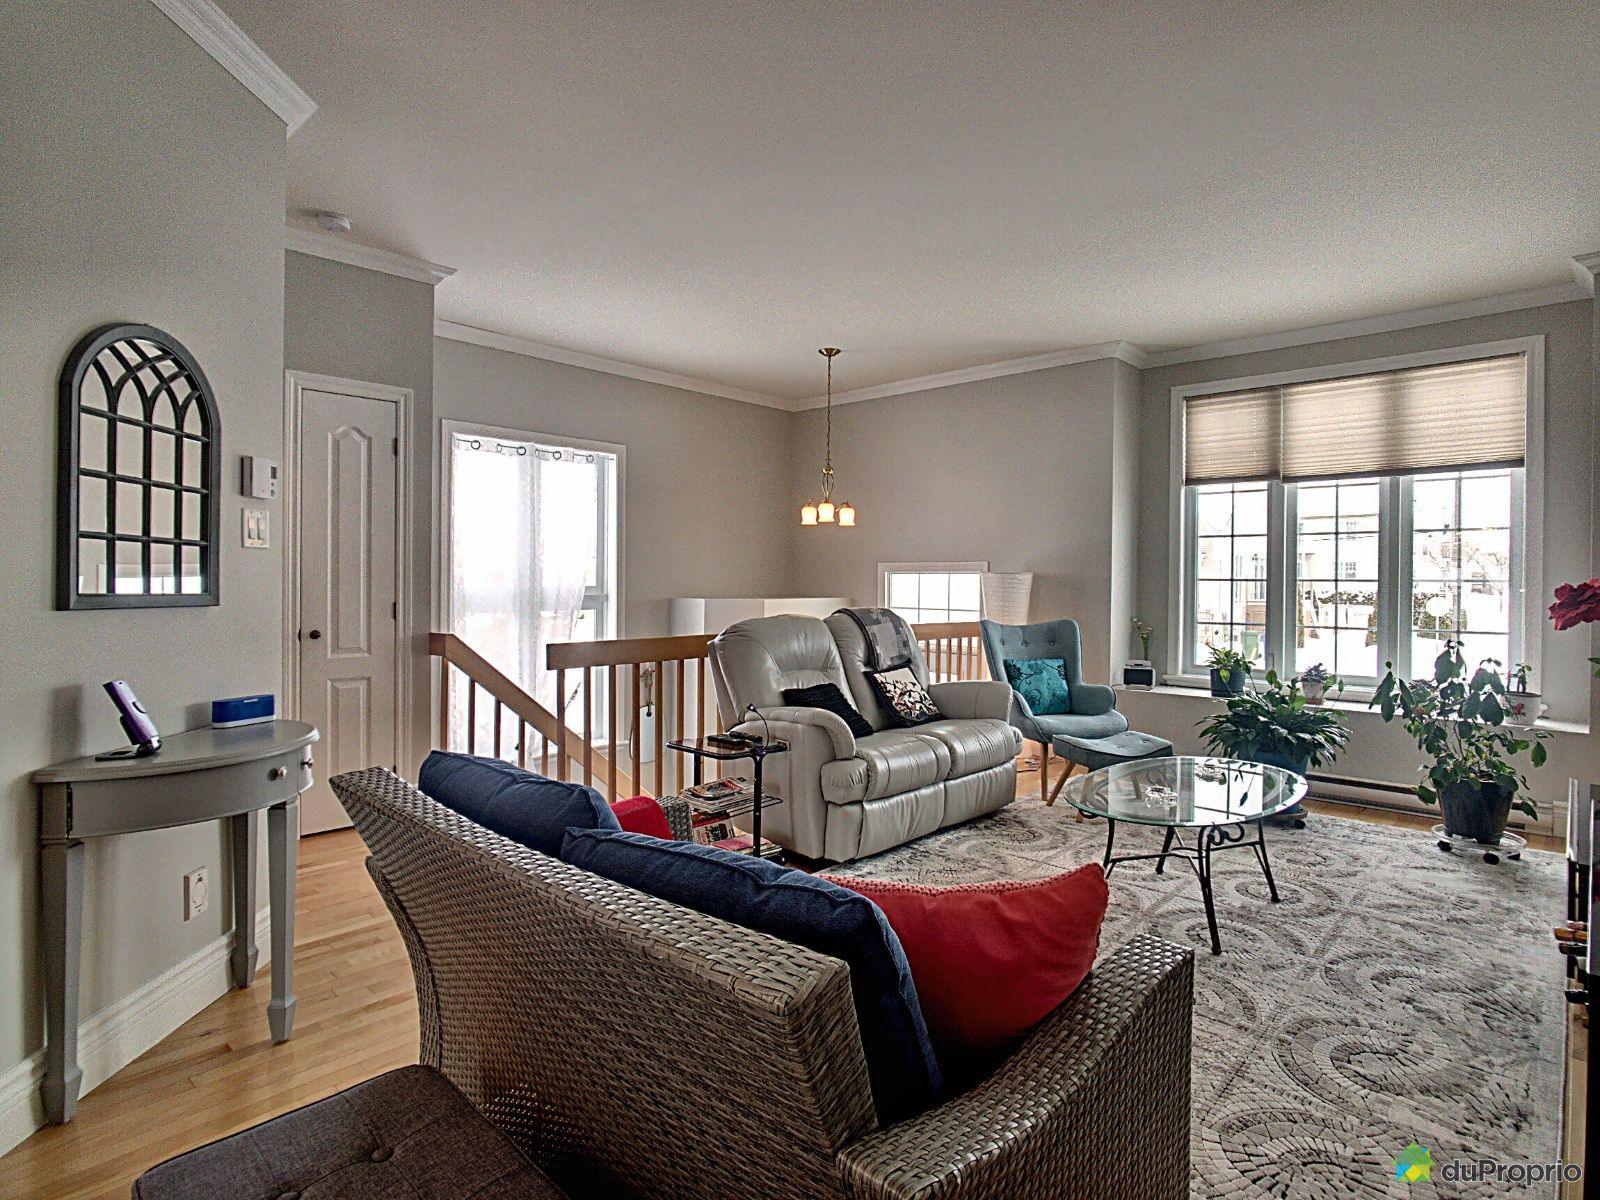 Living Room - 2016 rue des Clématites, Duberger for sale